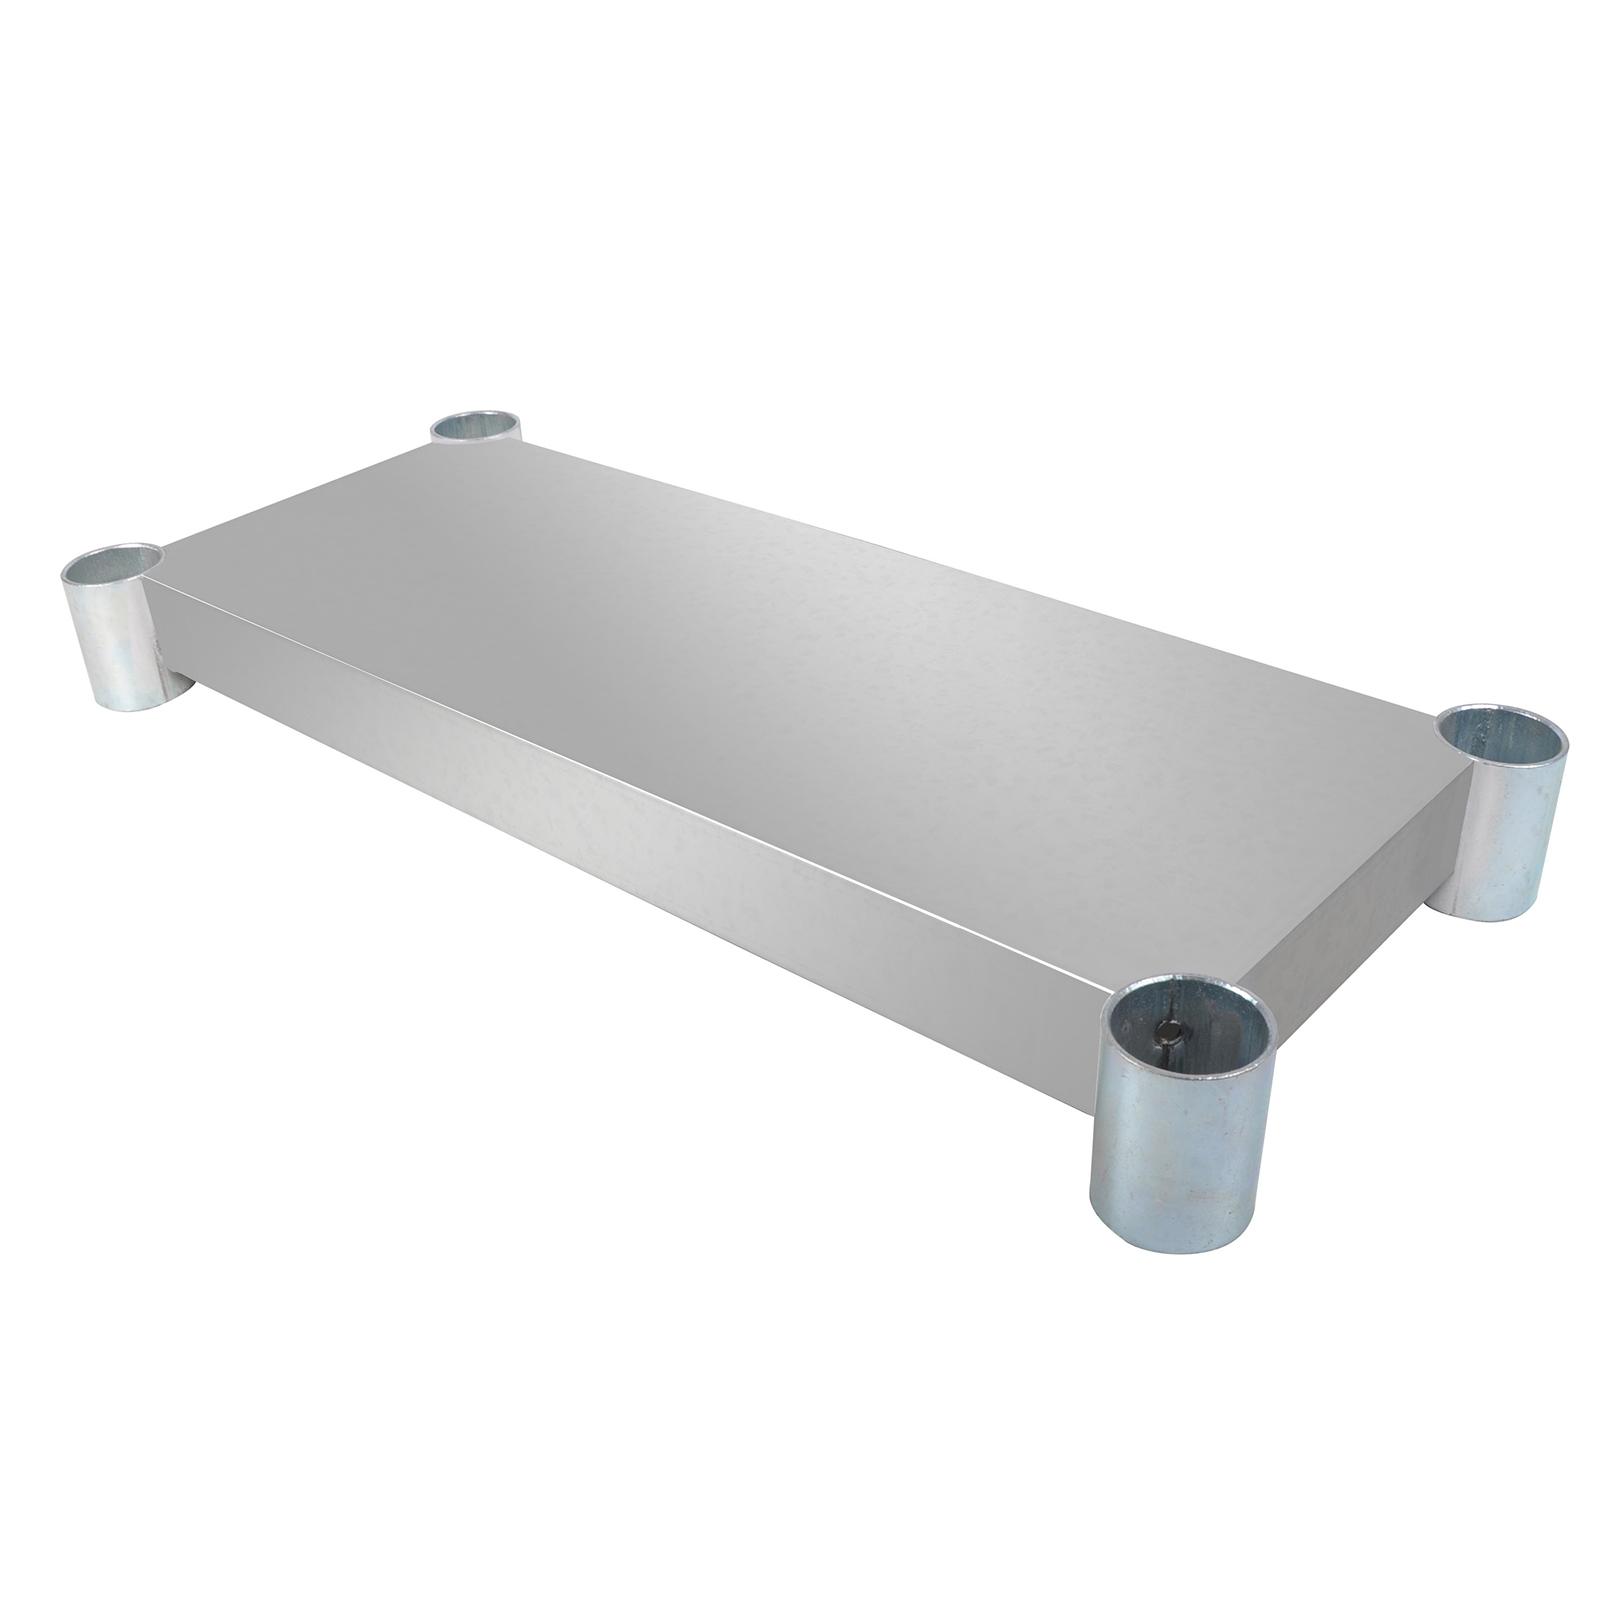 BK Resources SVTS-6030 work table, undershelf